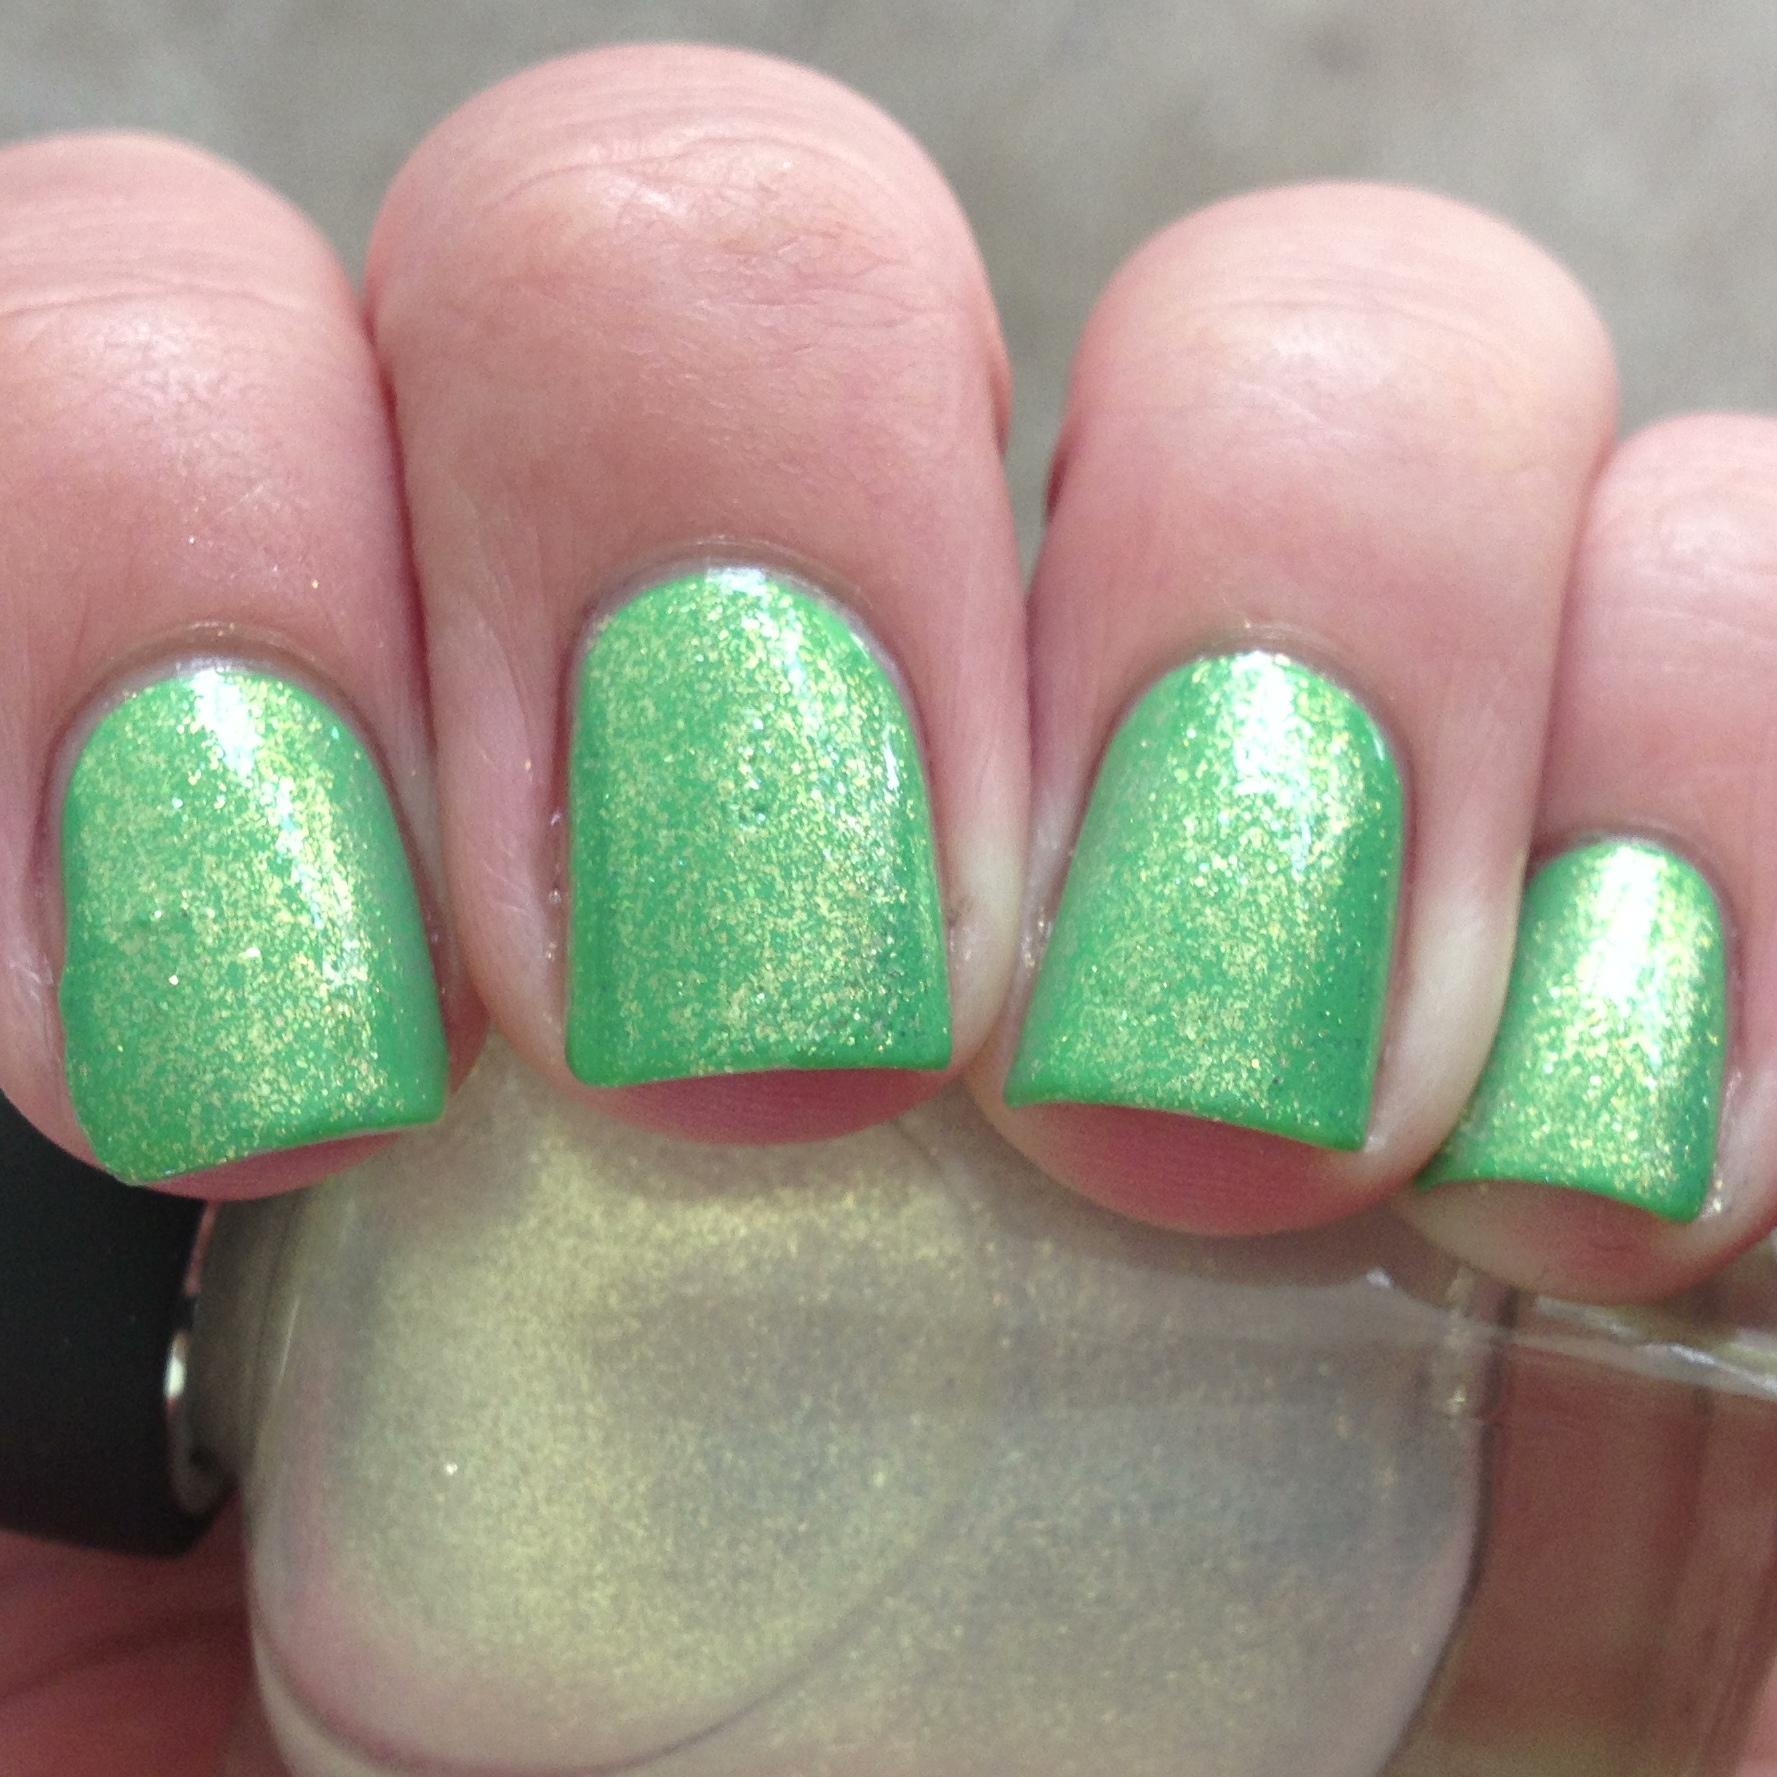 Sally Hansen Debu-Tint- My New Favorite Layering Polish! | Polish Me ...